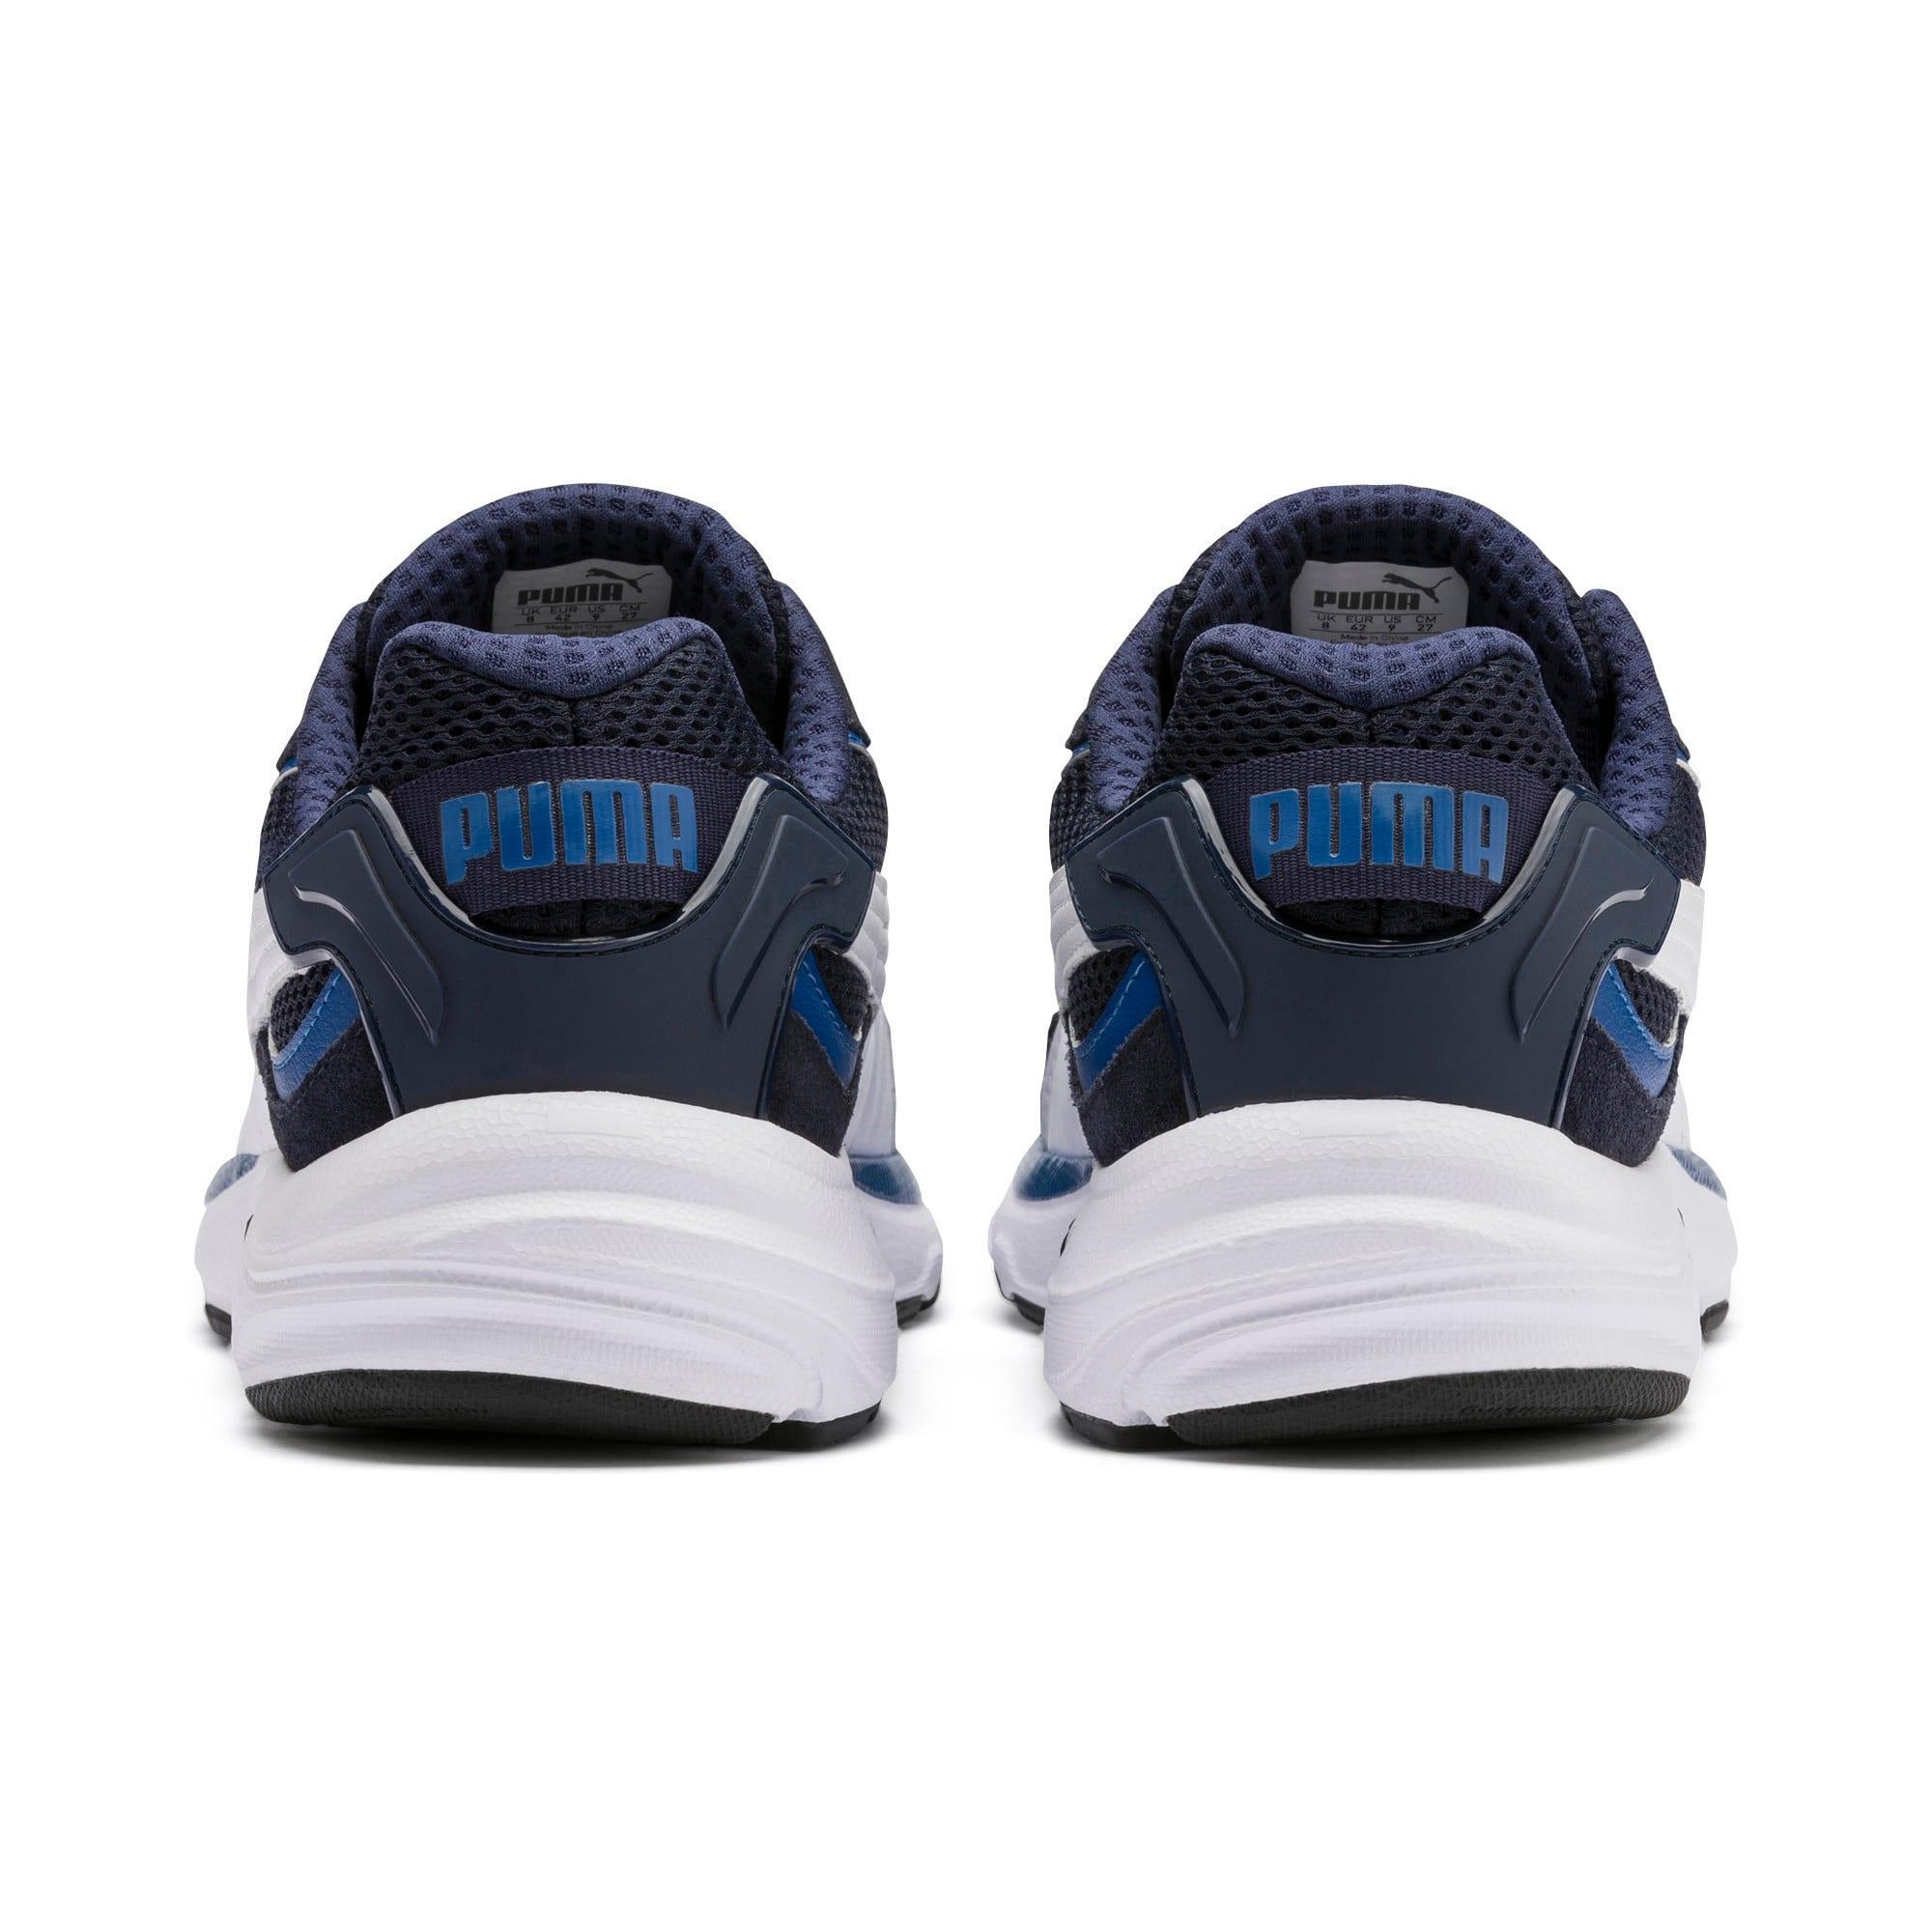 Miniatura 5 de Zapatos deportivos Axis Plus Suede, Peacoat-G Blue-White-Black, mediano